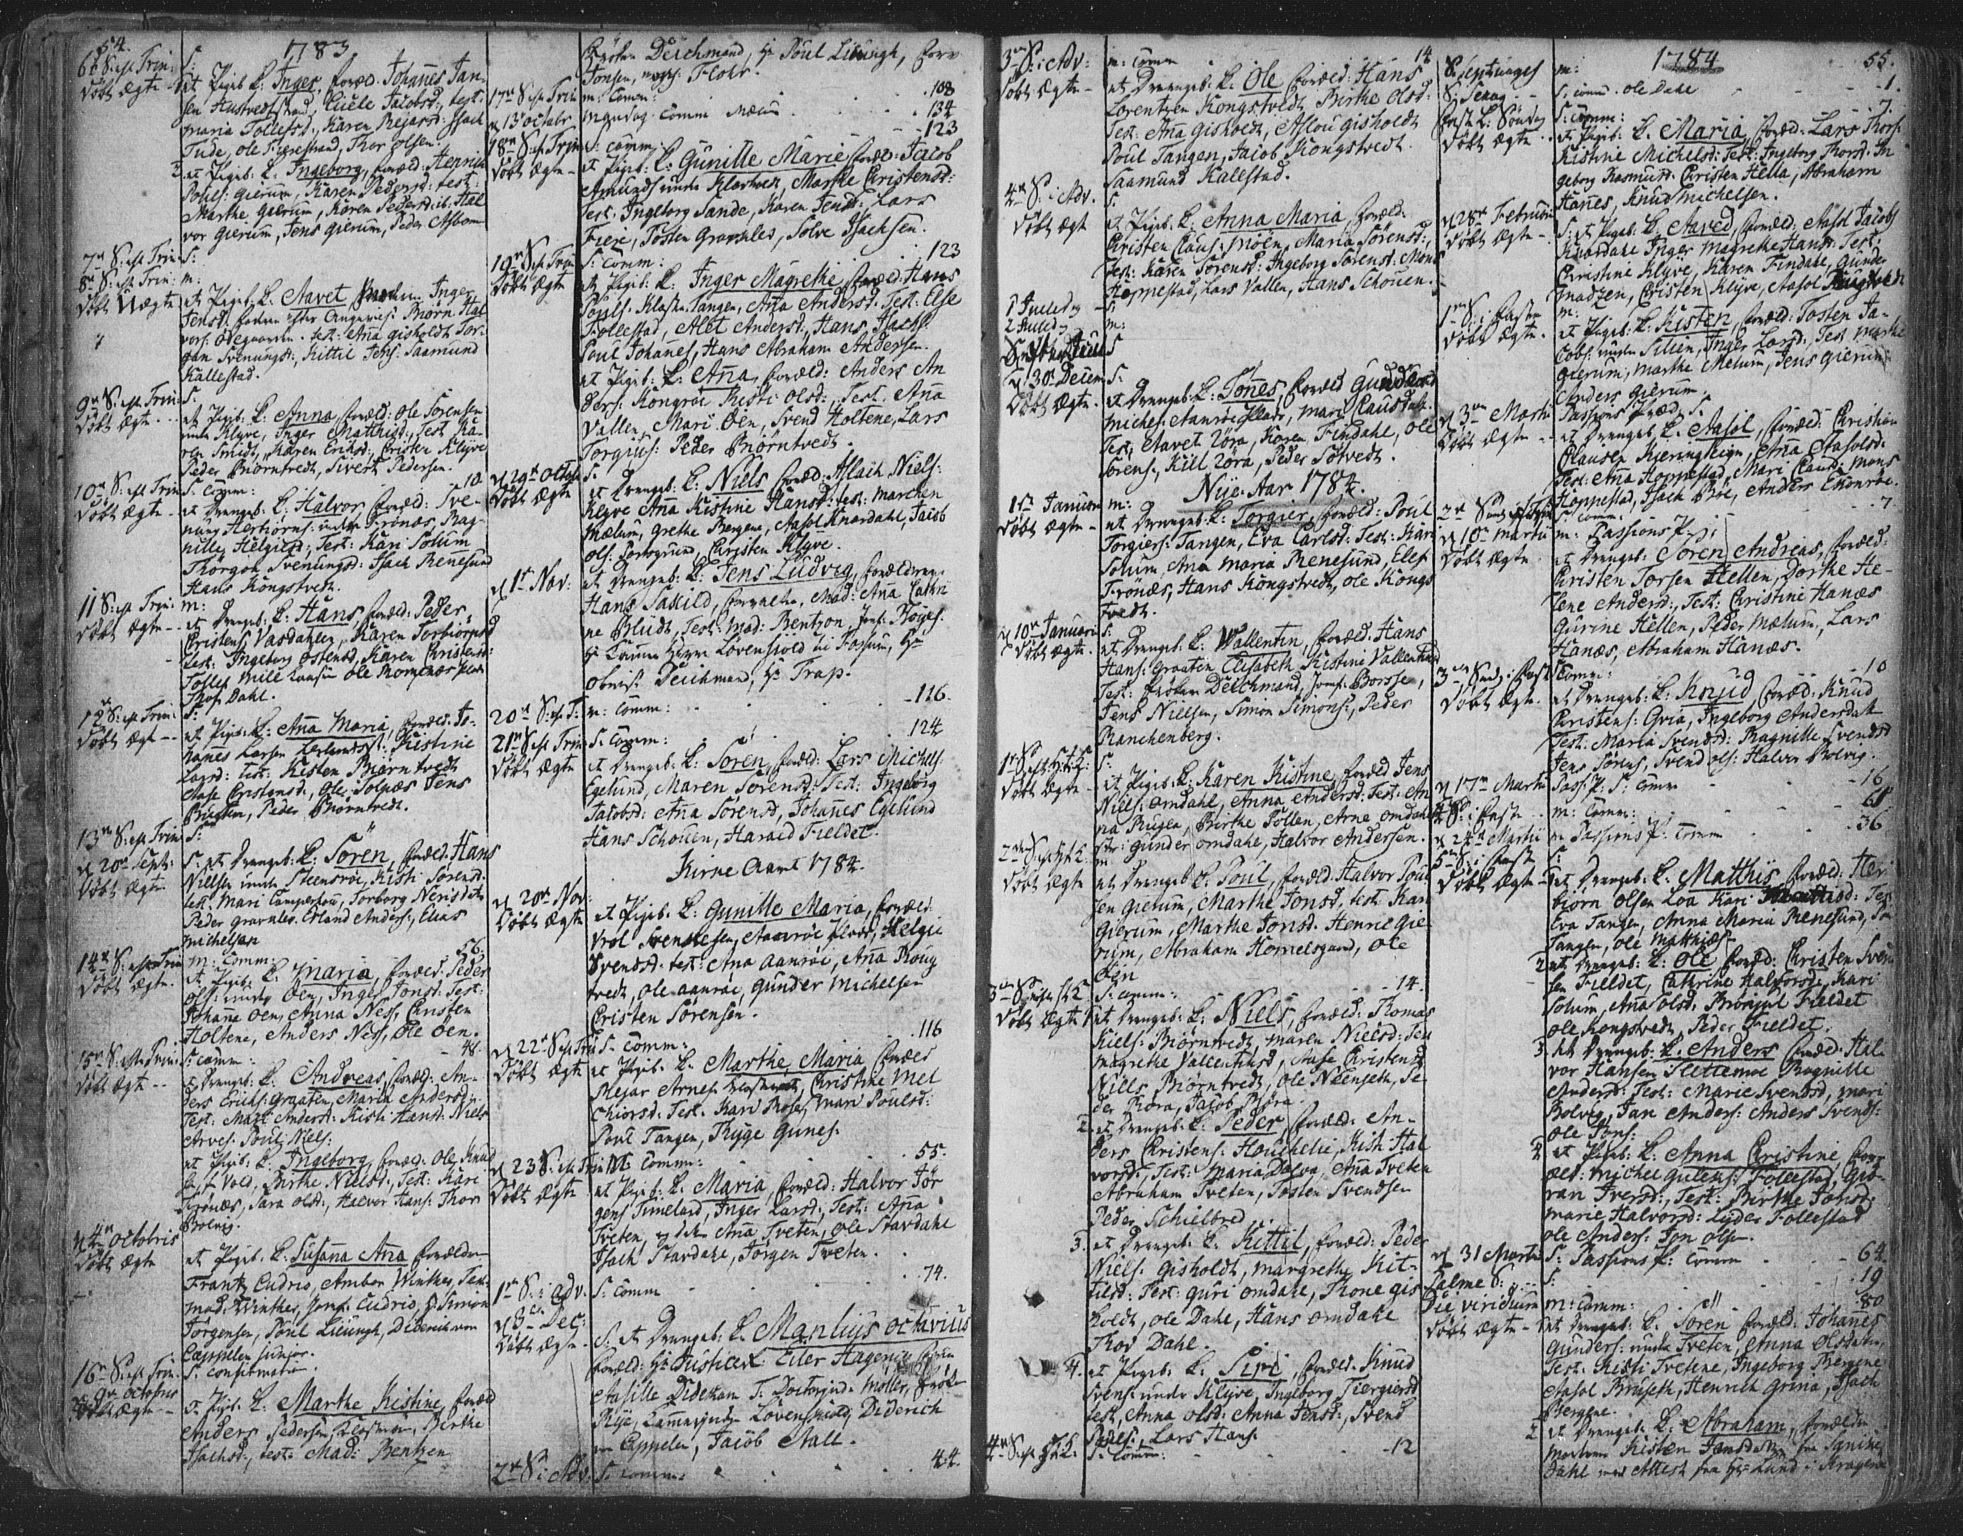 SAKO, Solum kirkebøker, F/Fa/L0003: Ministerialbok nr. I 3, 1761-1814, s. 54-55